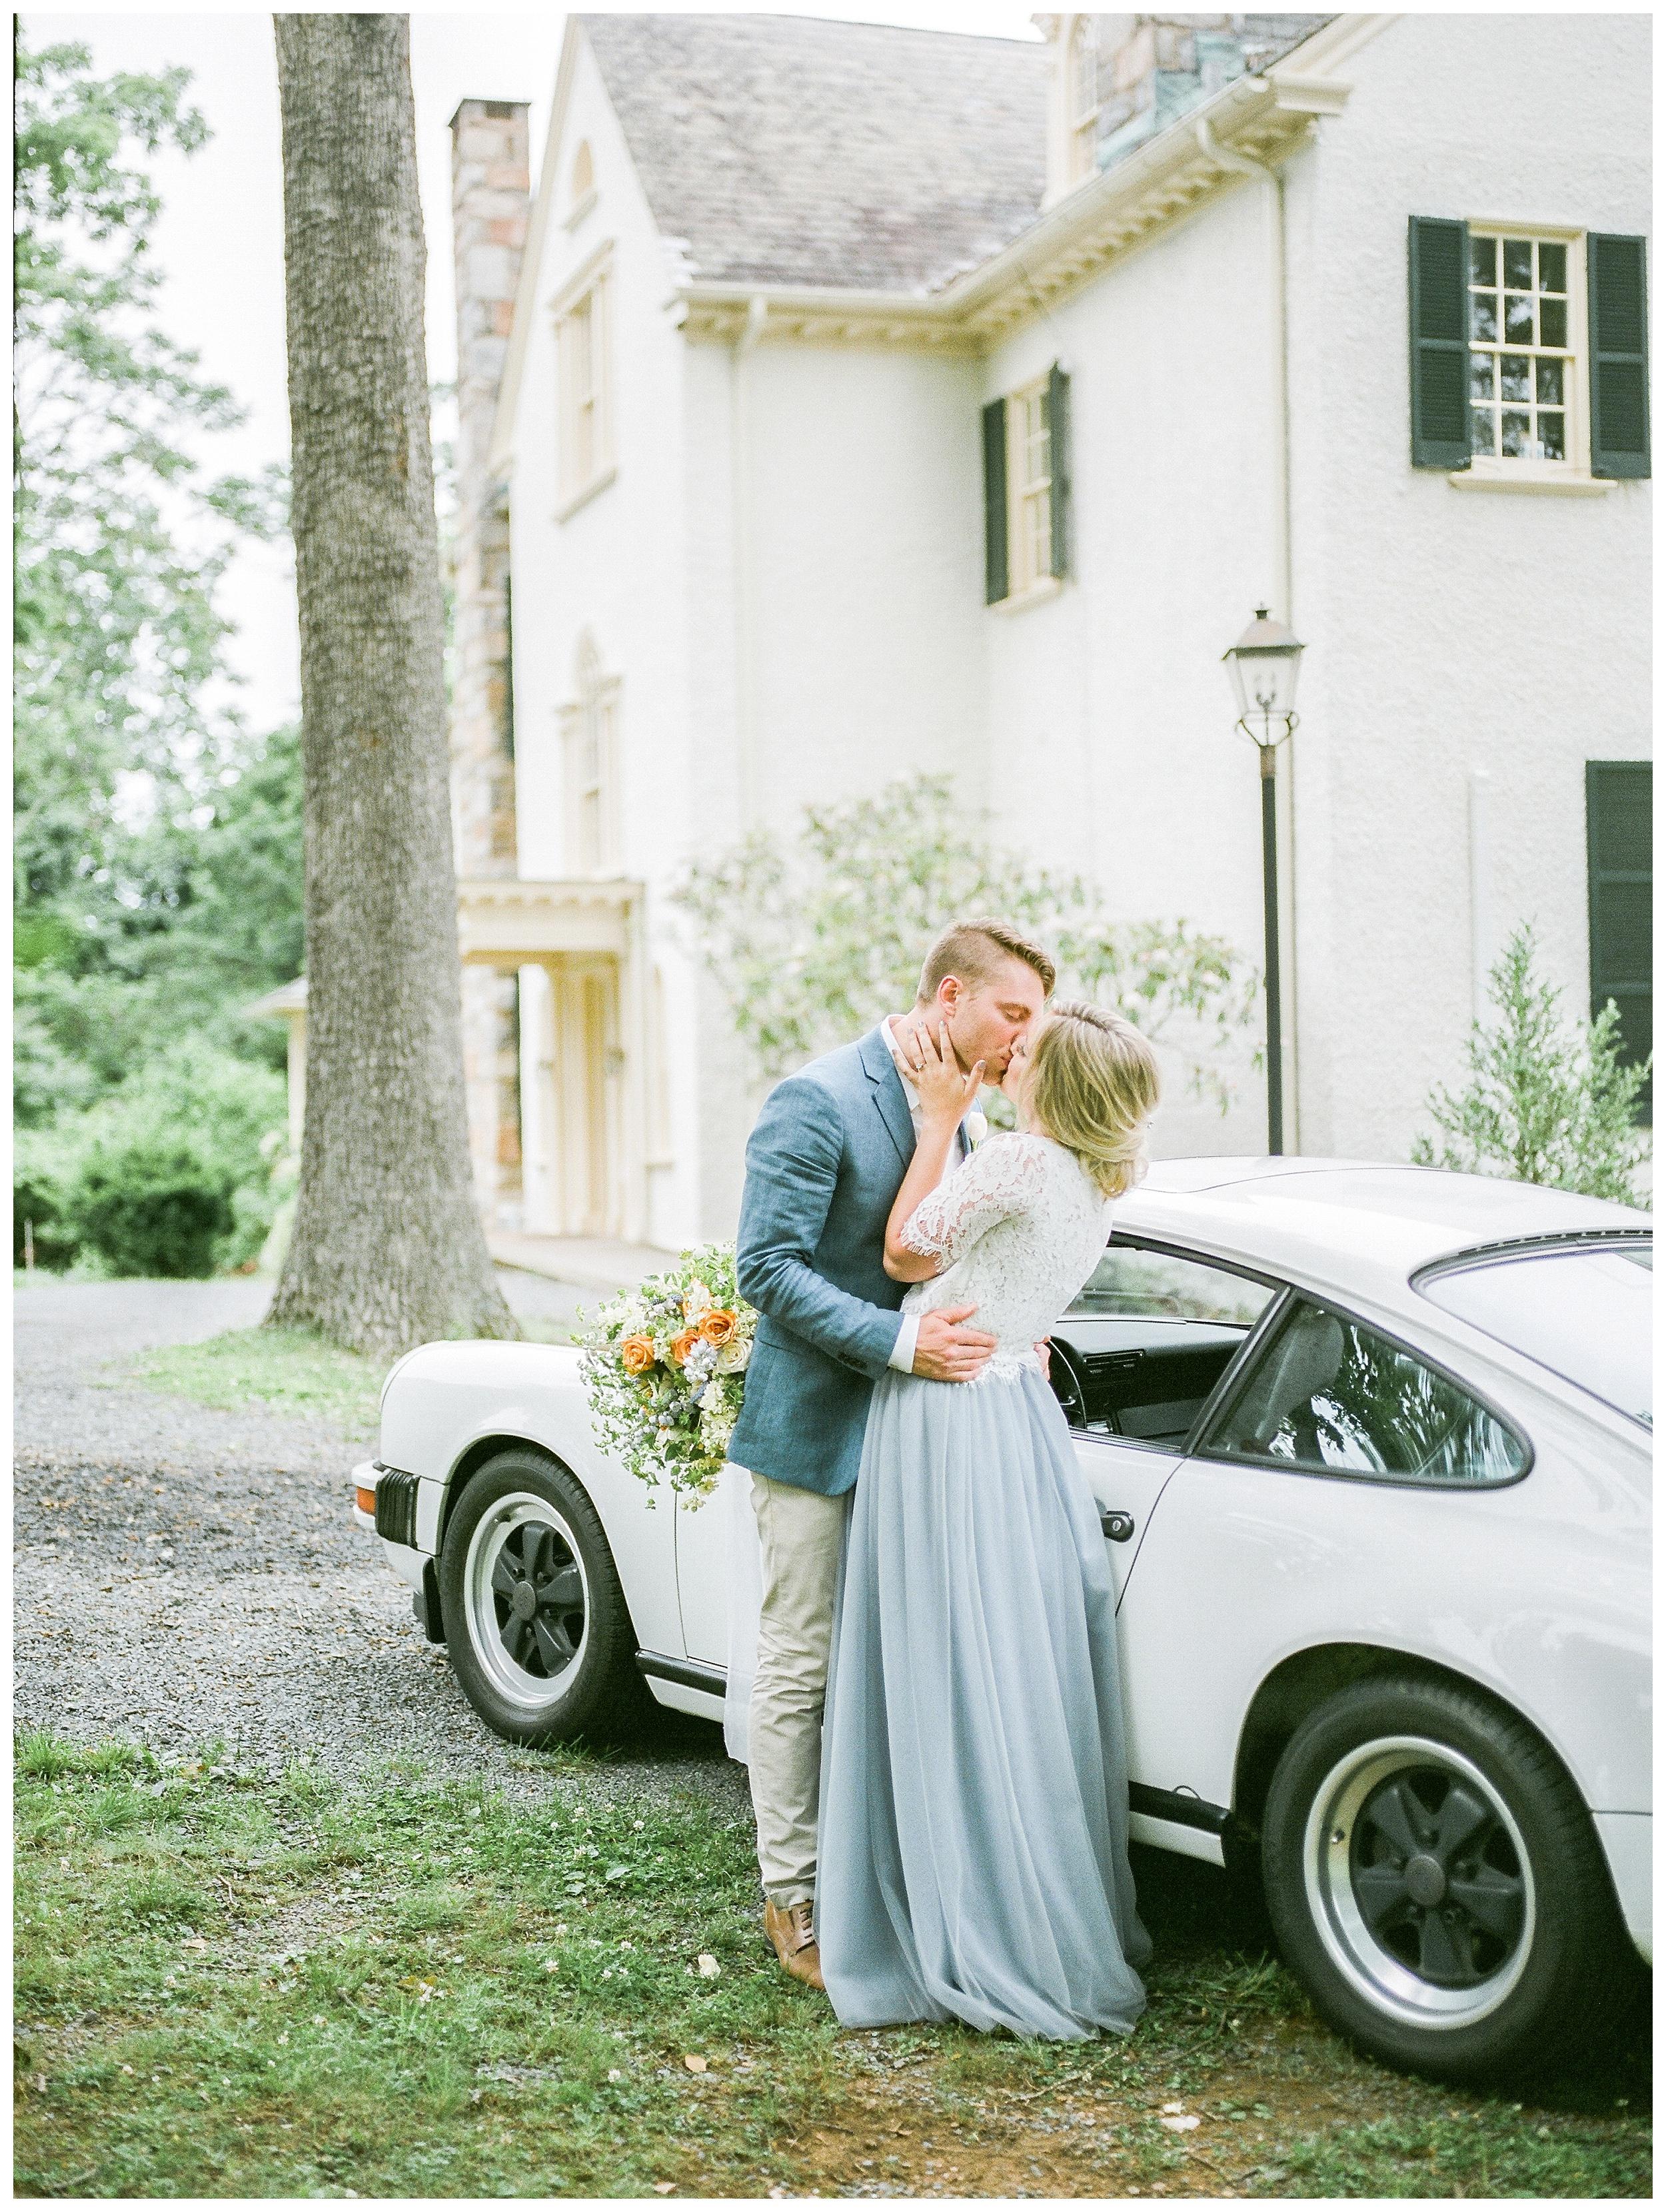 Rust Manor Wedding   Virginia Wedding Photographer Kir Tuben_0044.jpg